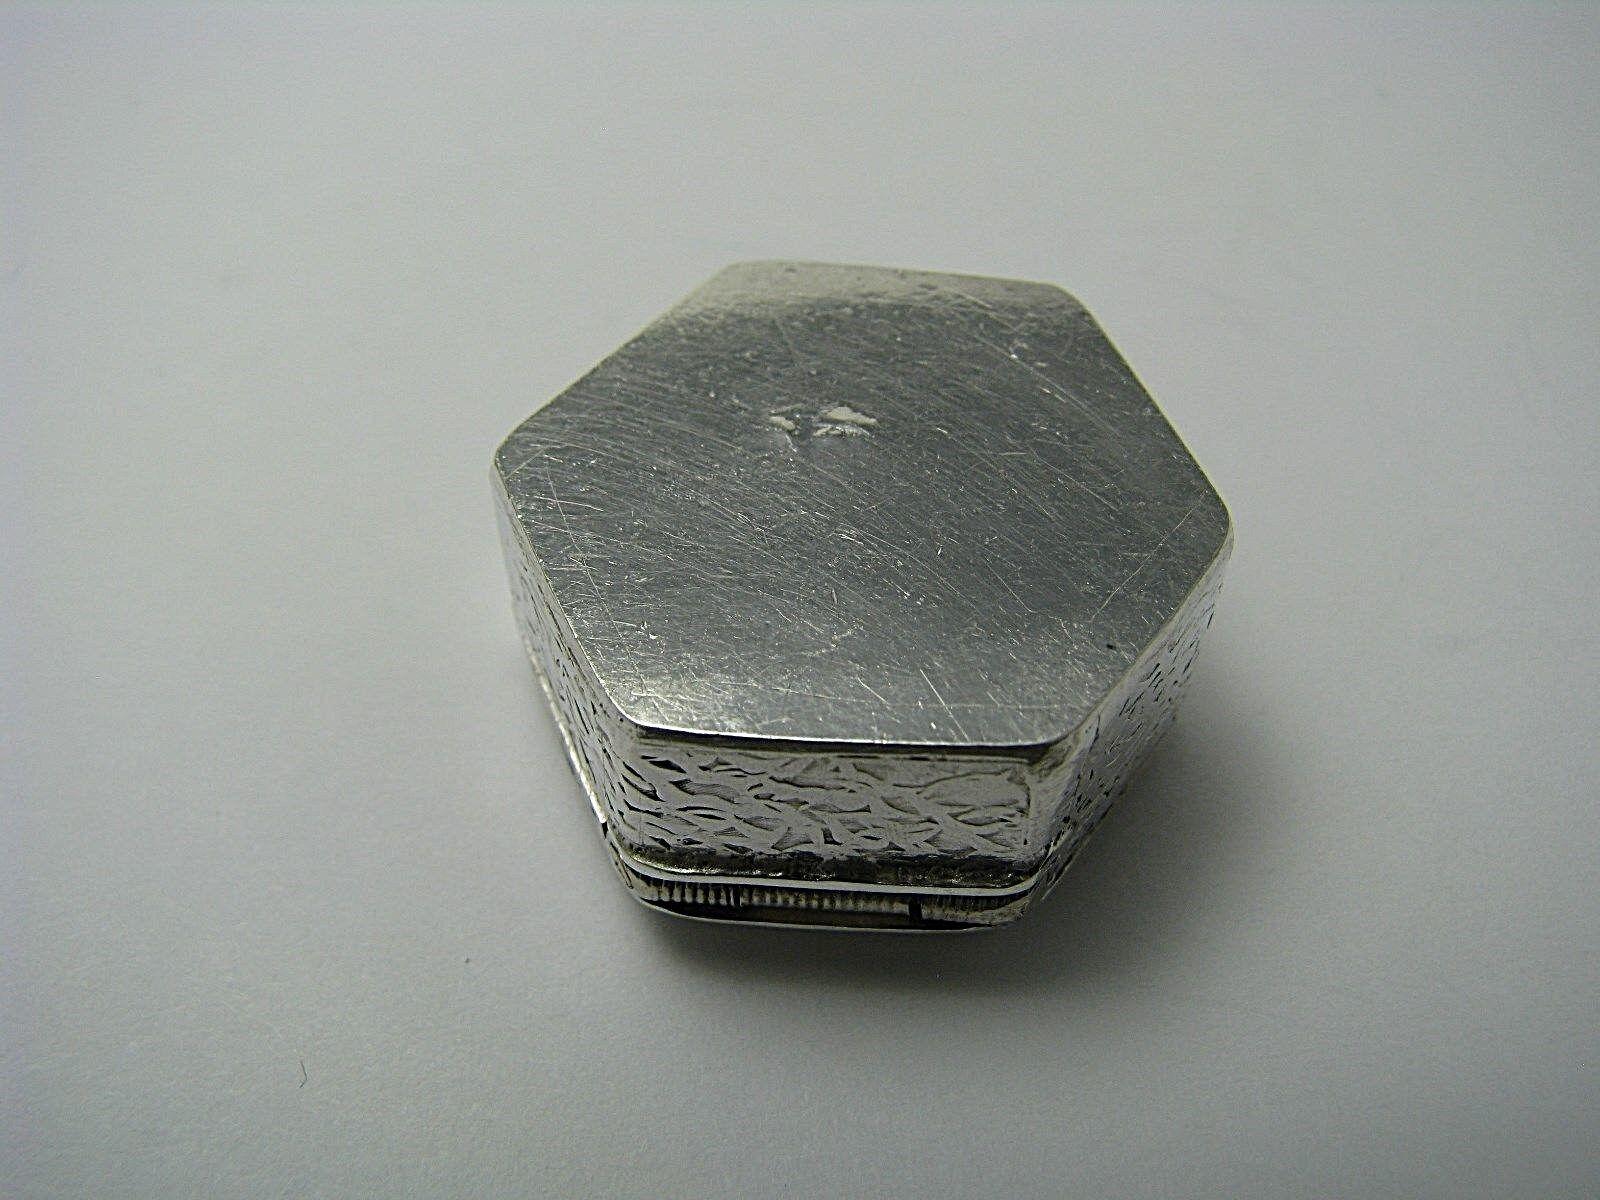 ANTIQUE SILVER PILL BOX PILLBOX NIELLO ENAMEL OPIUM BOX 900 Silver Ca1900s Rare  - $175.00